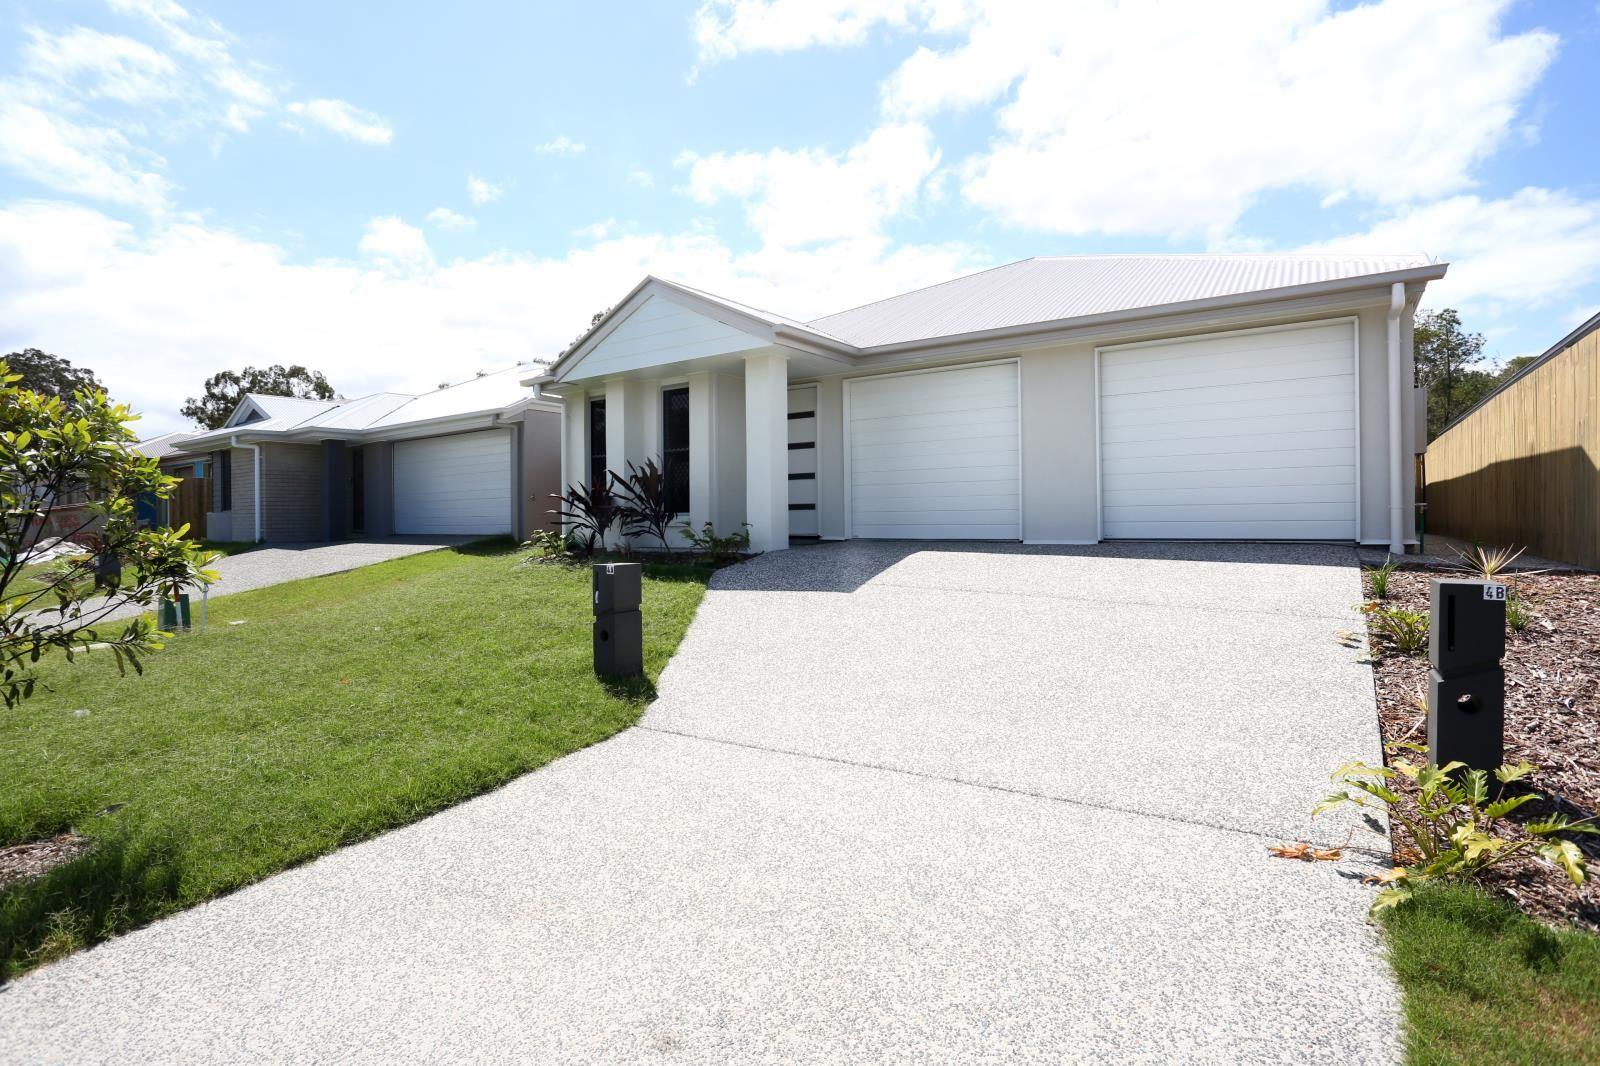 2/4 Havenswood Street, Burpengary QLD 4505, Image 0